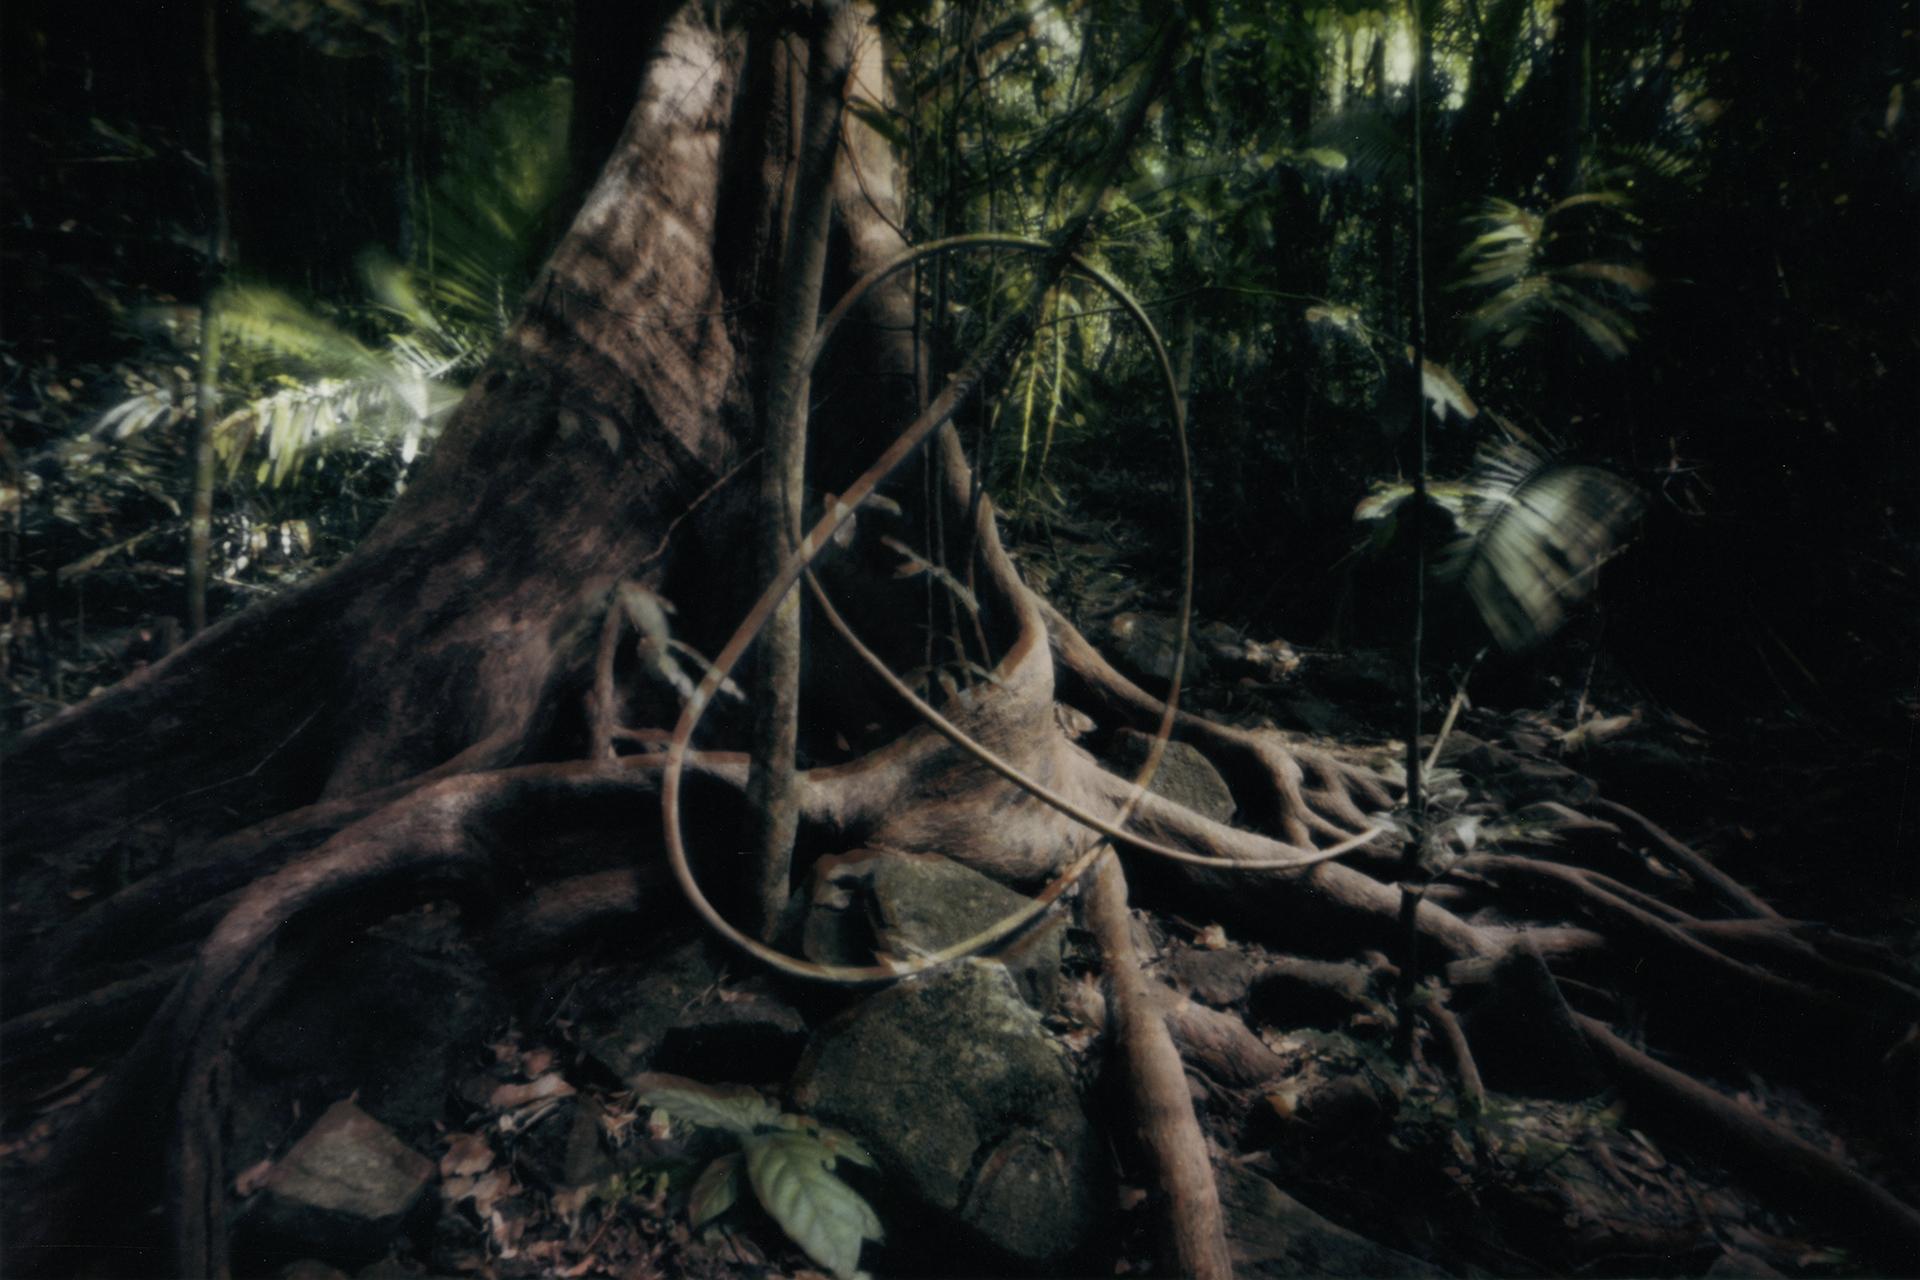 Knot. Cape Tribulation, Australia, 2013